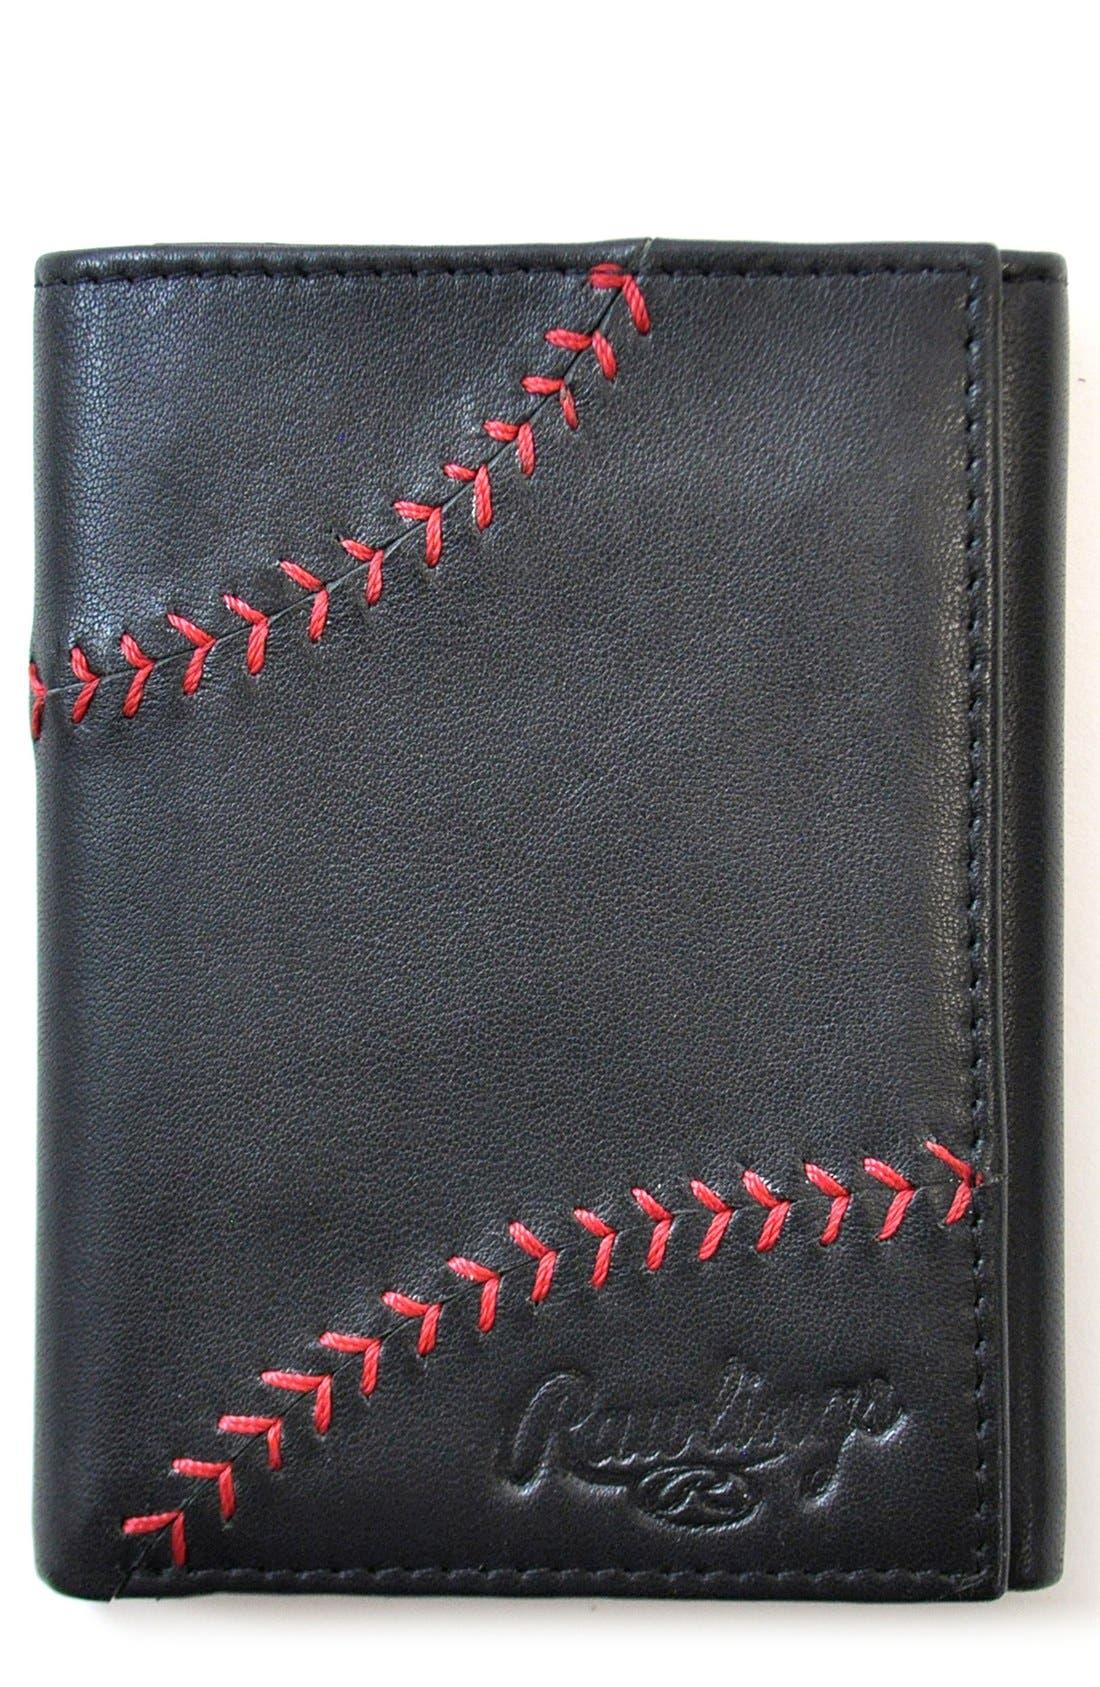 Rawlings® Baseball Stitch Leather Trifold Wallet